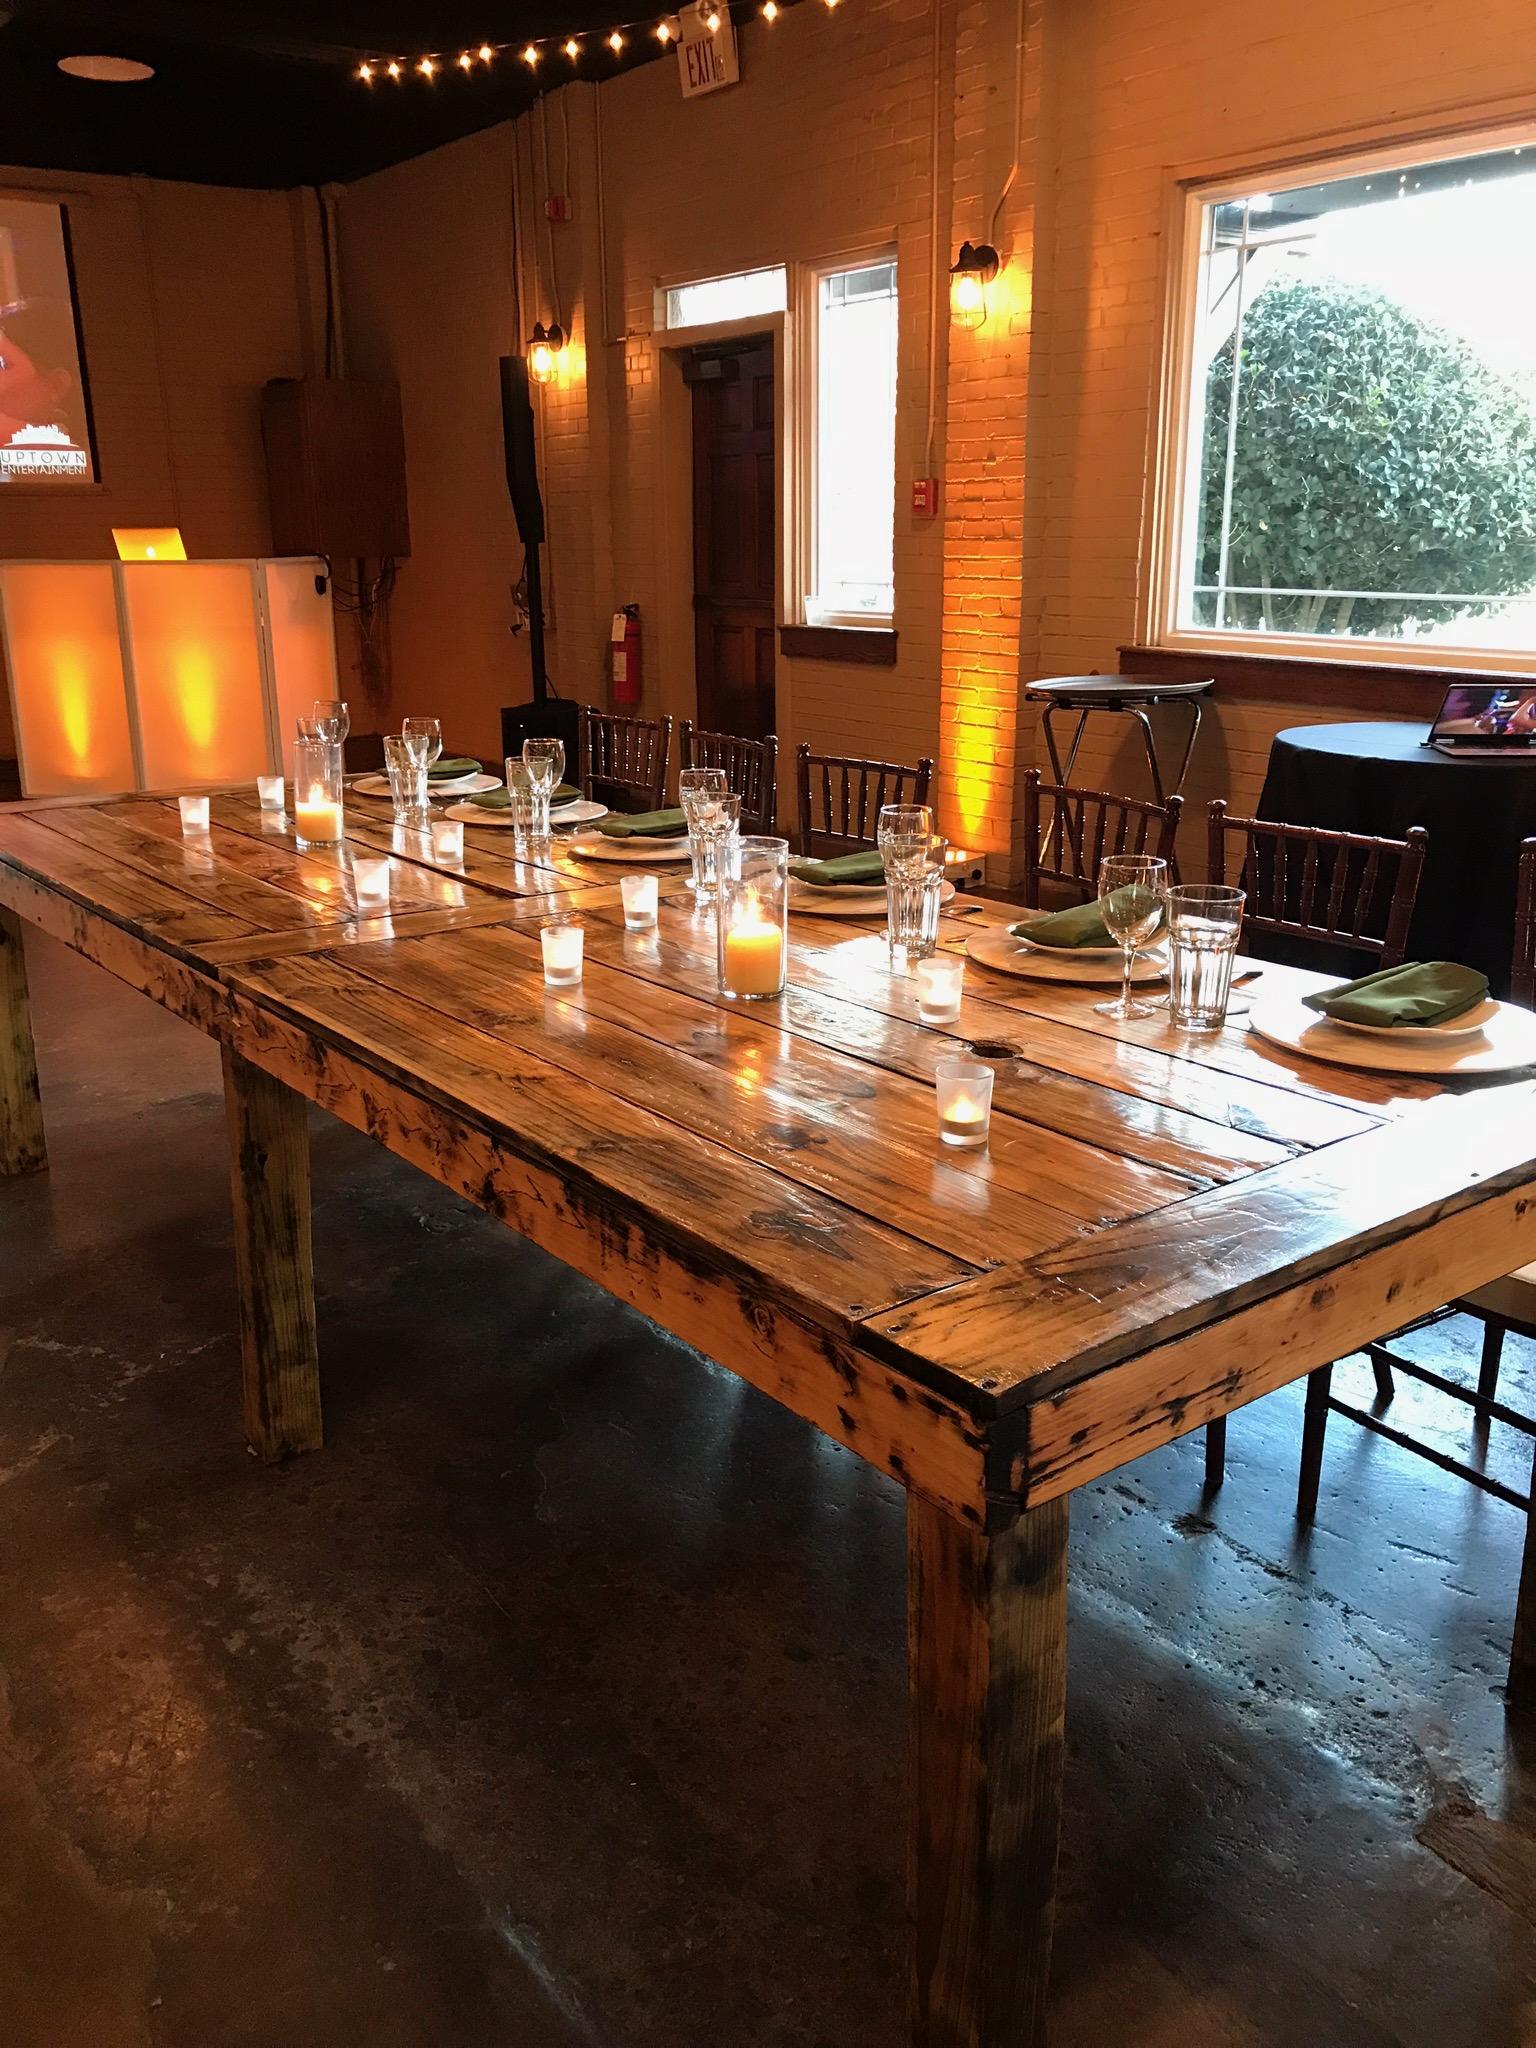 Sawmill | Catering in Greenville, SC